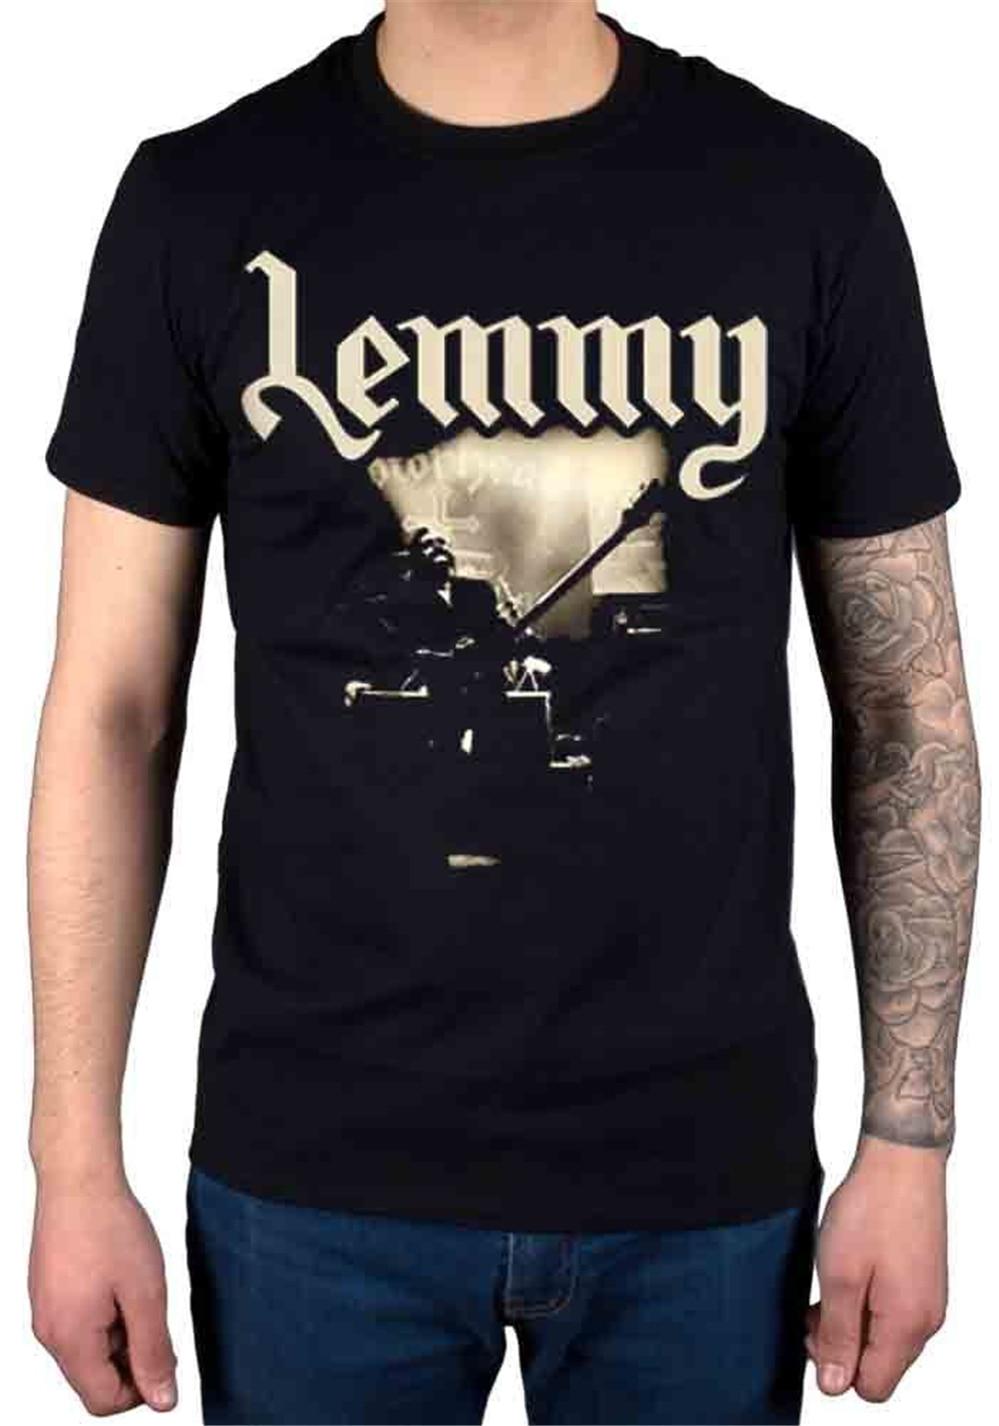 Lemmy Lived To Win New T Shirt Men Women Kilmister R.I.P Merch Ace Of Spades Fashion Classic Tee Shirt